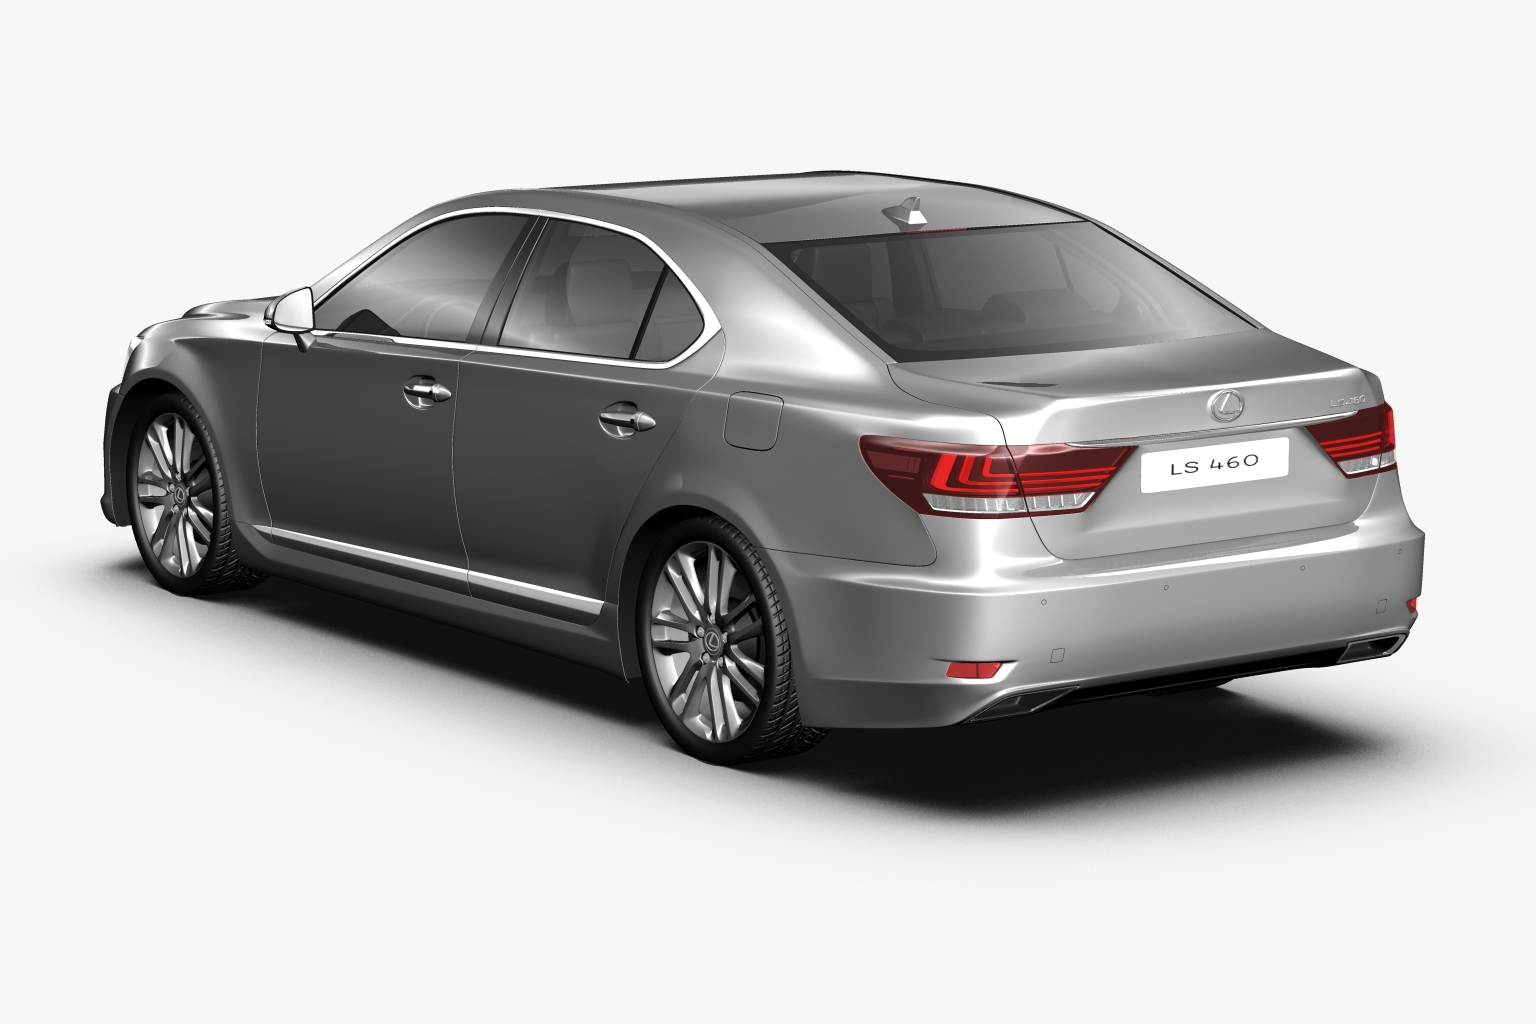 lexus review honest car john carbycar